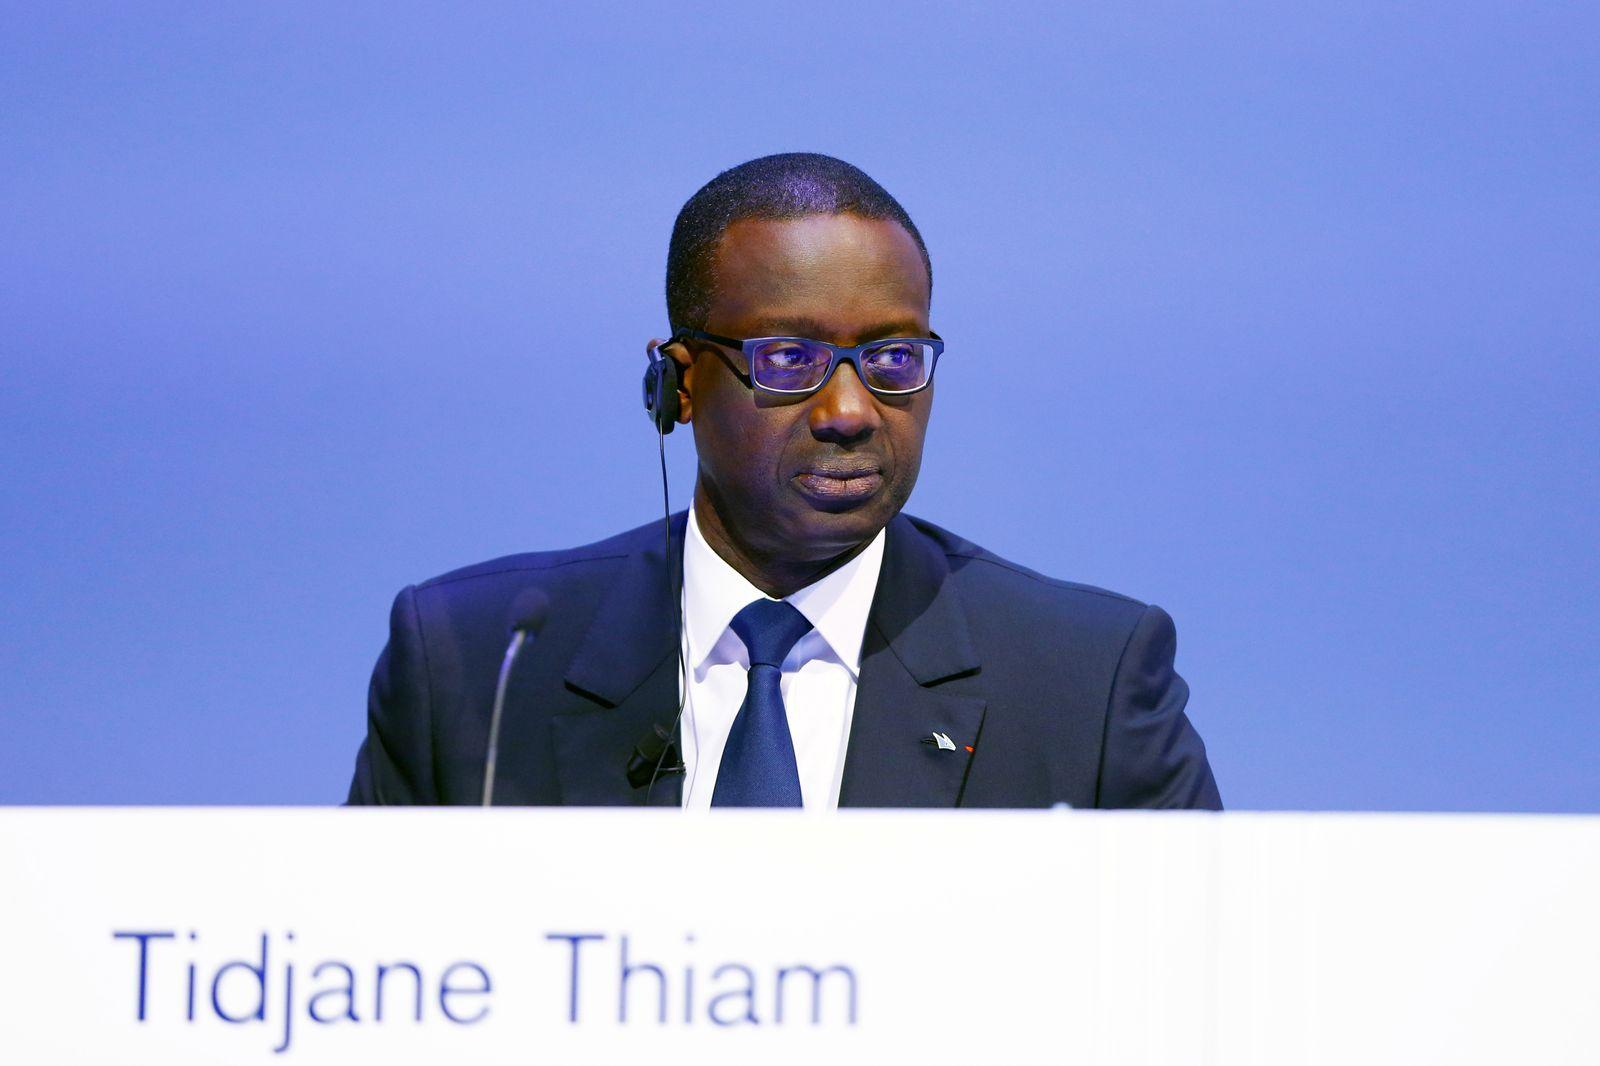 Banker/ Kampf/ Tidjane Thiam